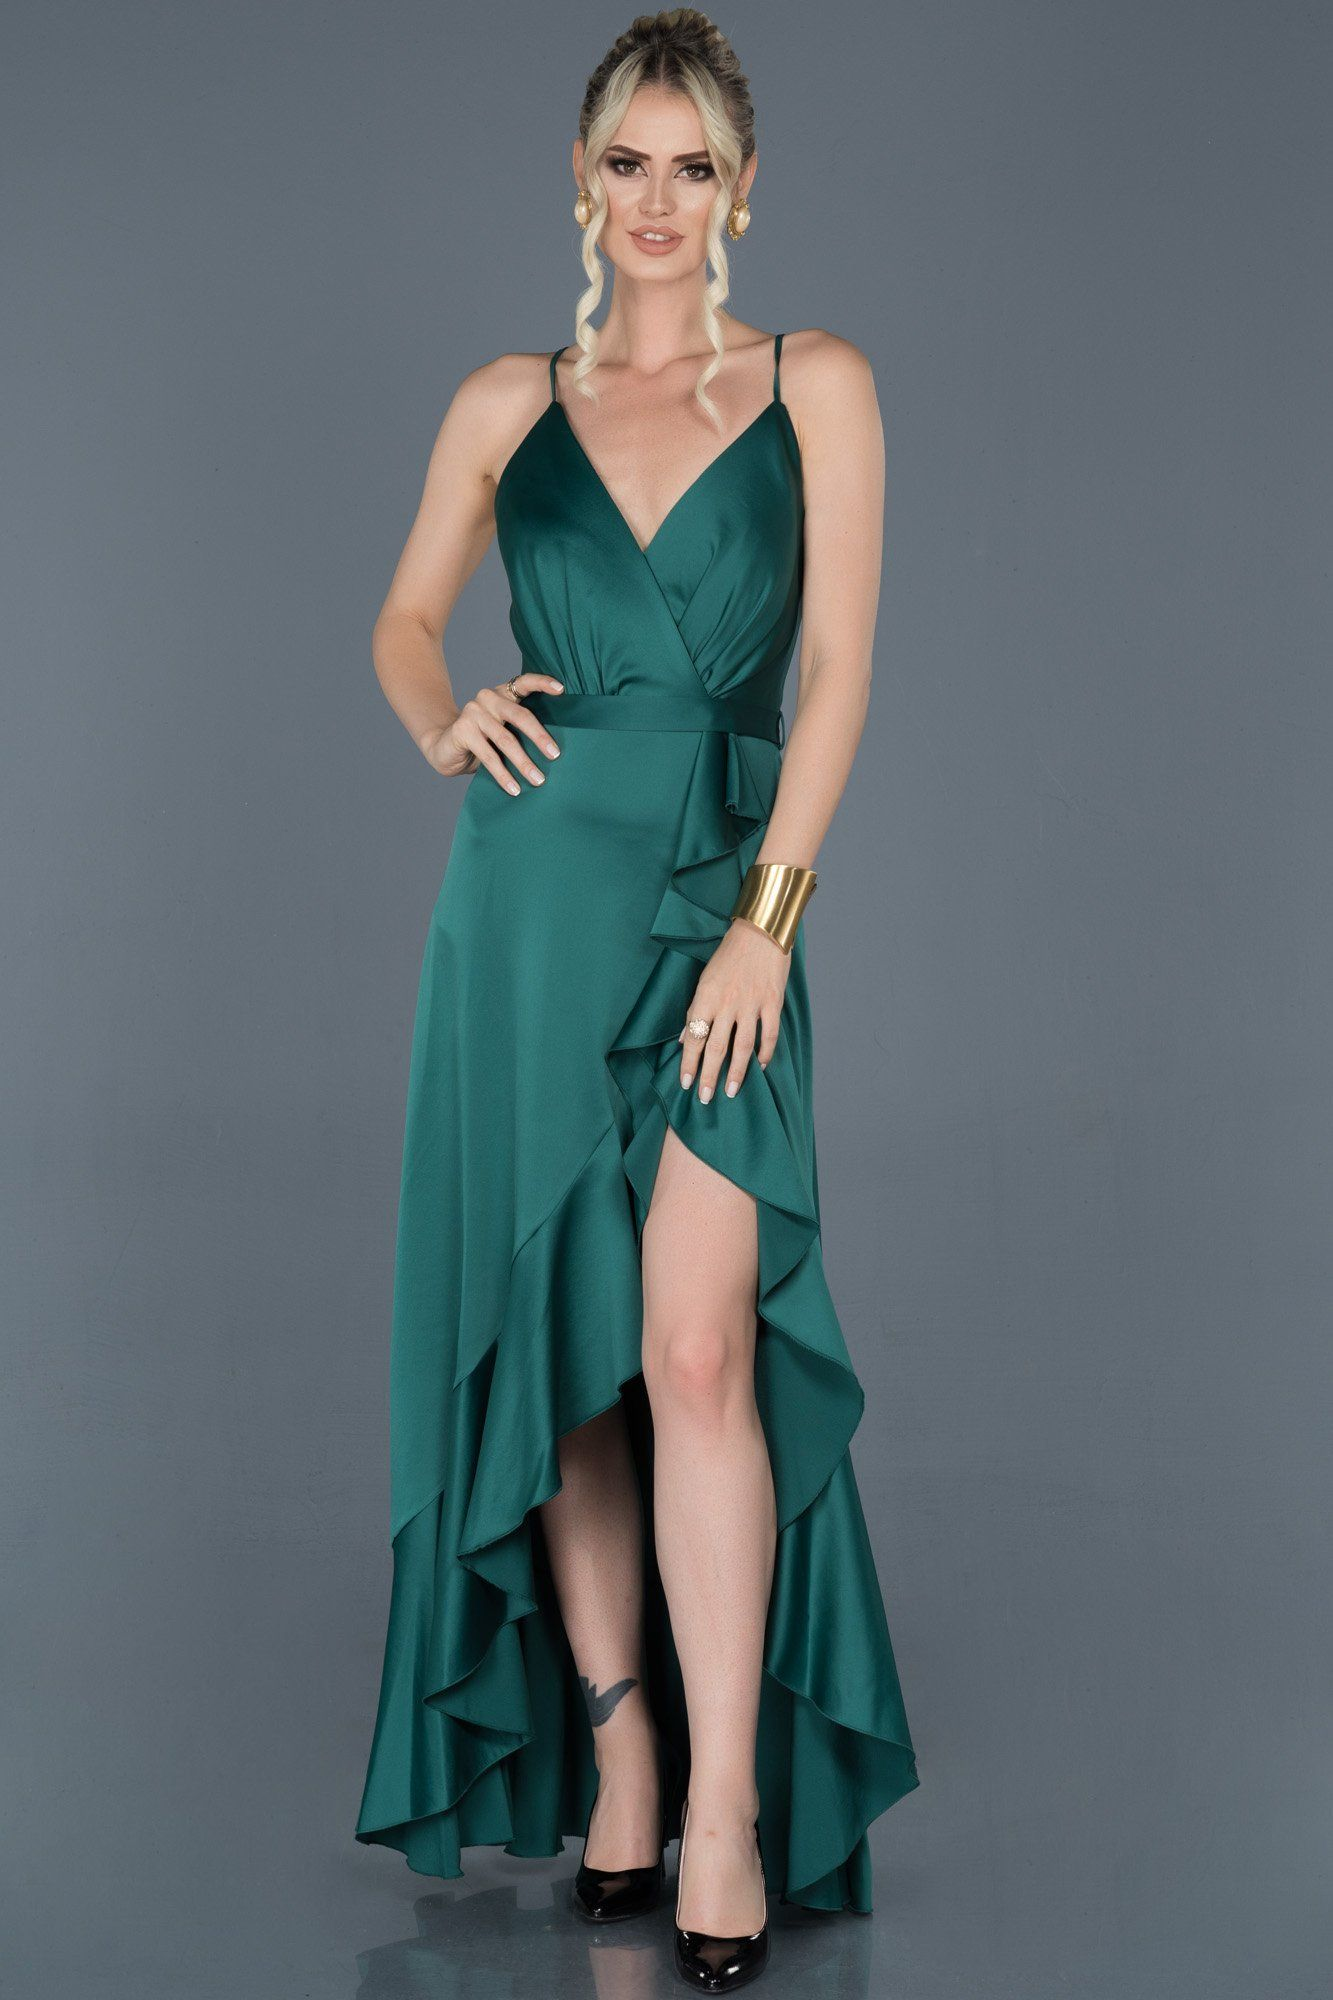 Yirtmacli Abiyeler Slit Dresses Panosundaki Pin